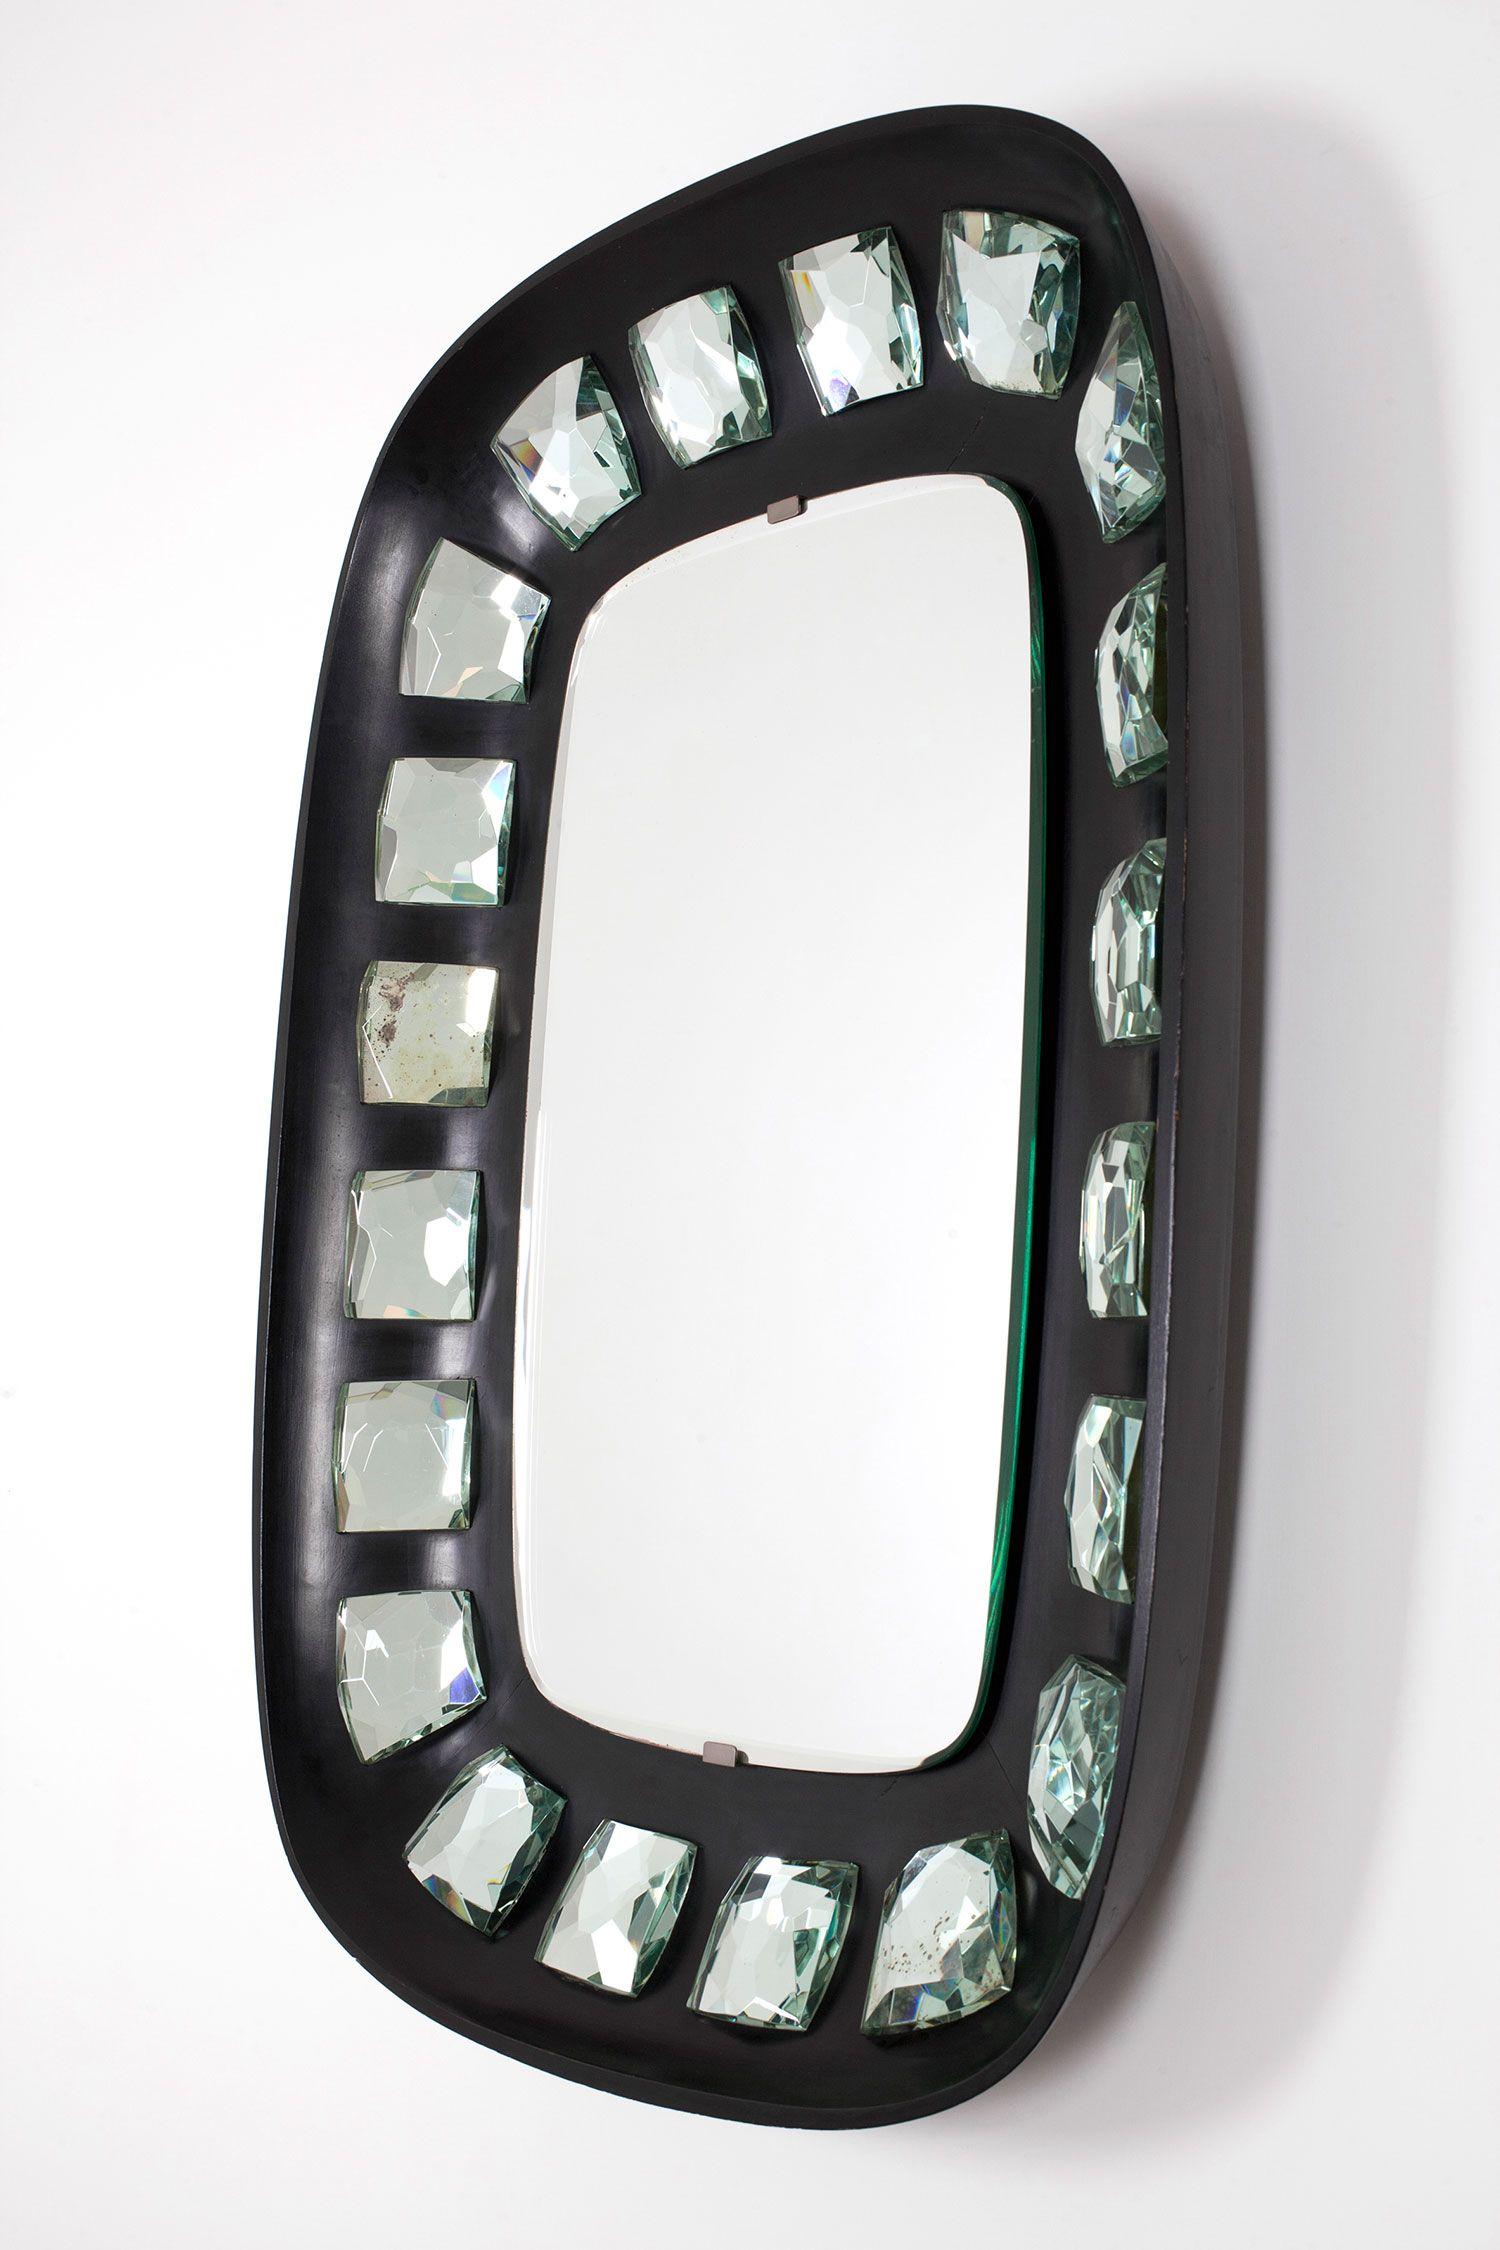 MAX INGRAND Mod. 2045 Mirror 1957 Black polished wood frame set-in ...